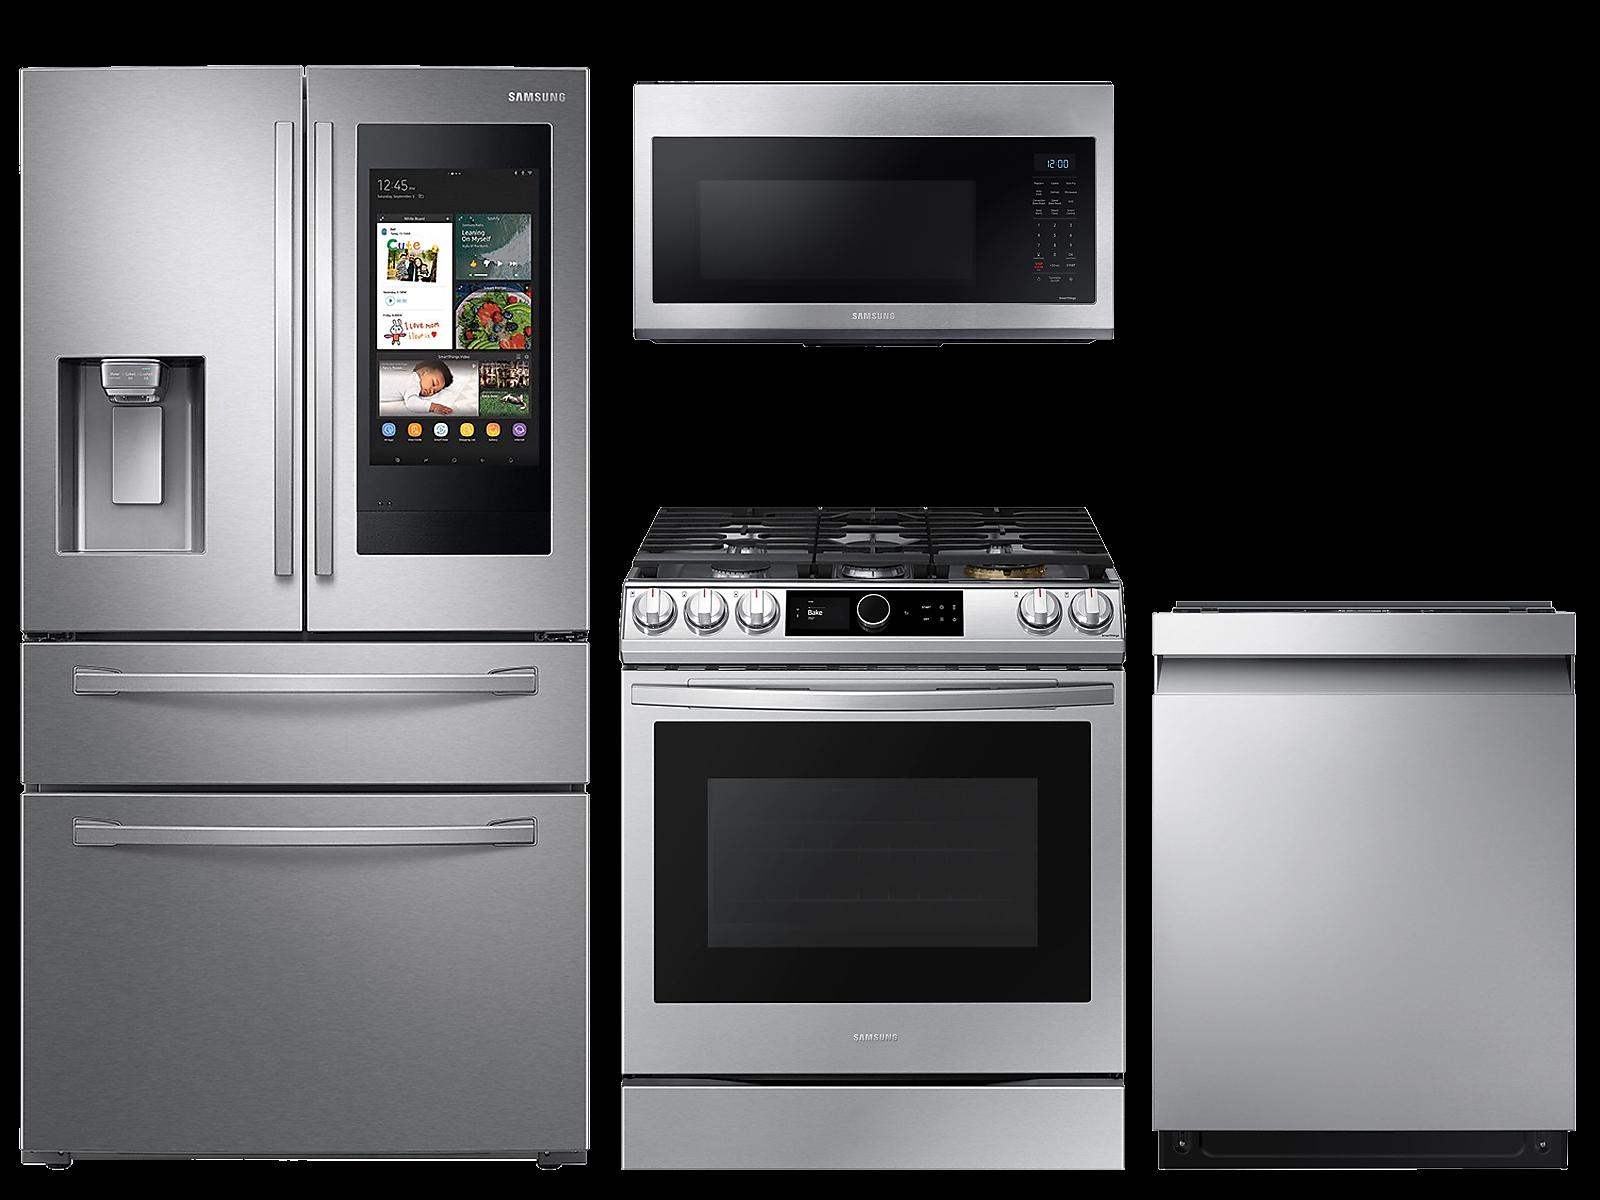 Samsung coupon: Samsung 28 cu. ft. Family HubTM 4-door refrigerator, gas range, microwave and 42 dBA dishwasher package(BNDL-1614633194949)